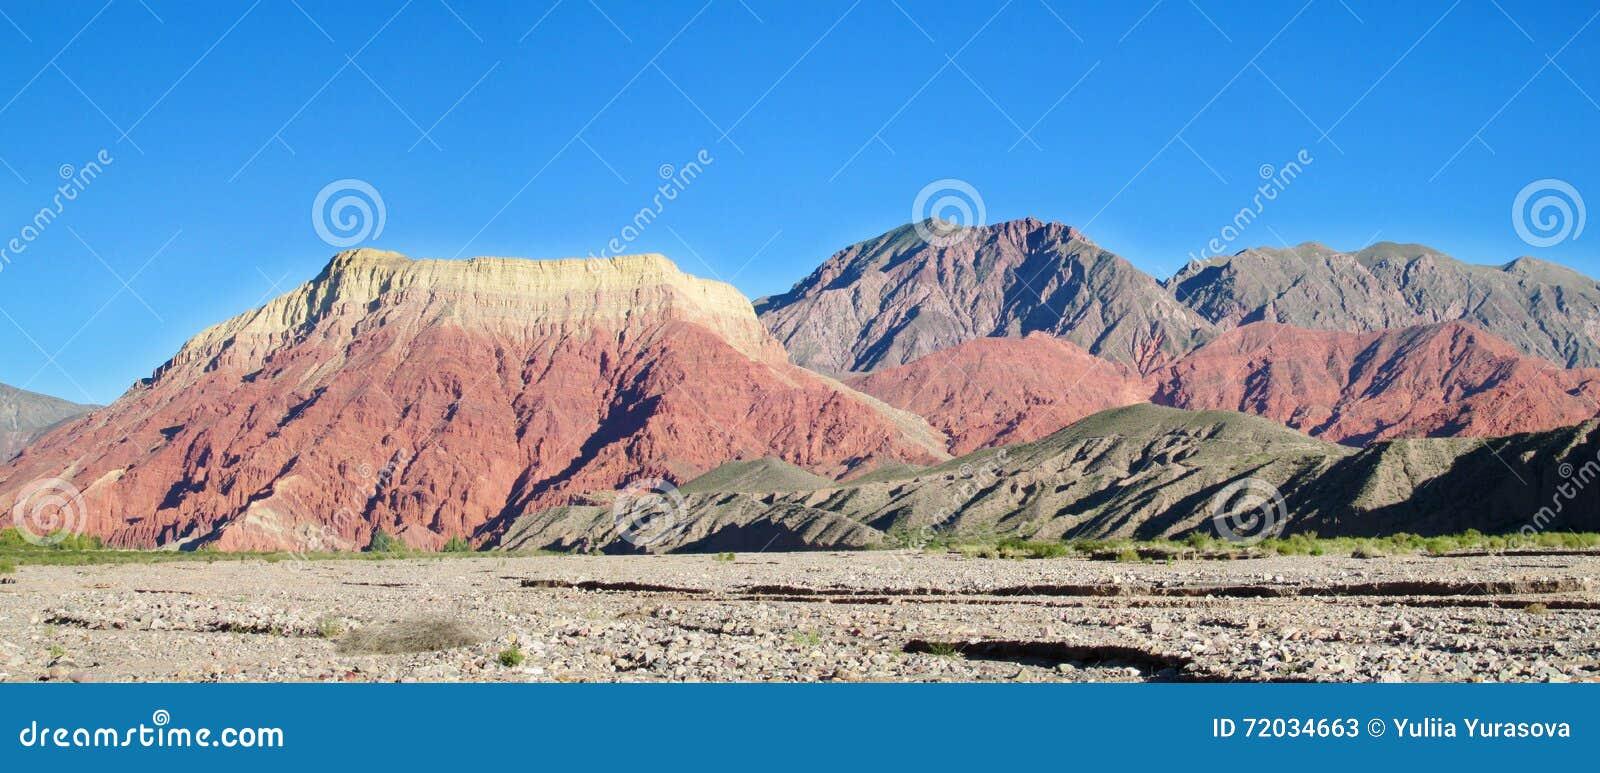 La Pollera De La Coya Red Mountain In Argentina Stock Photo